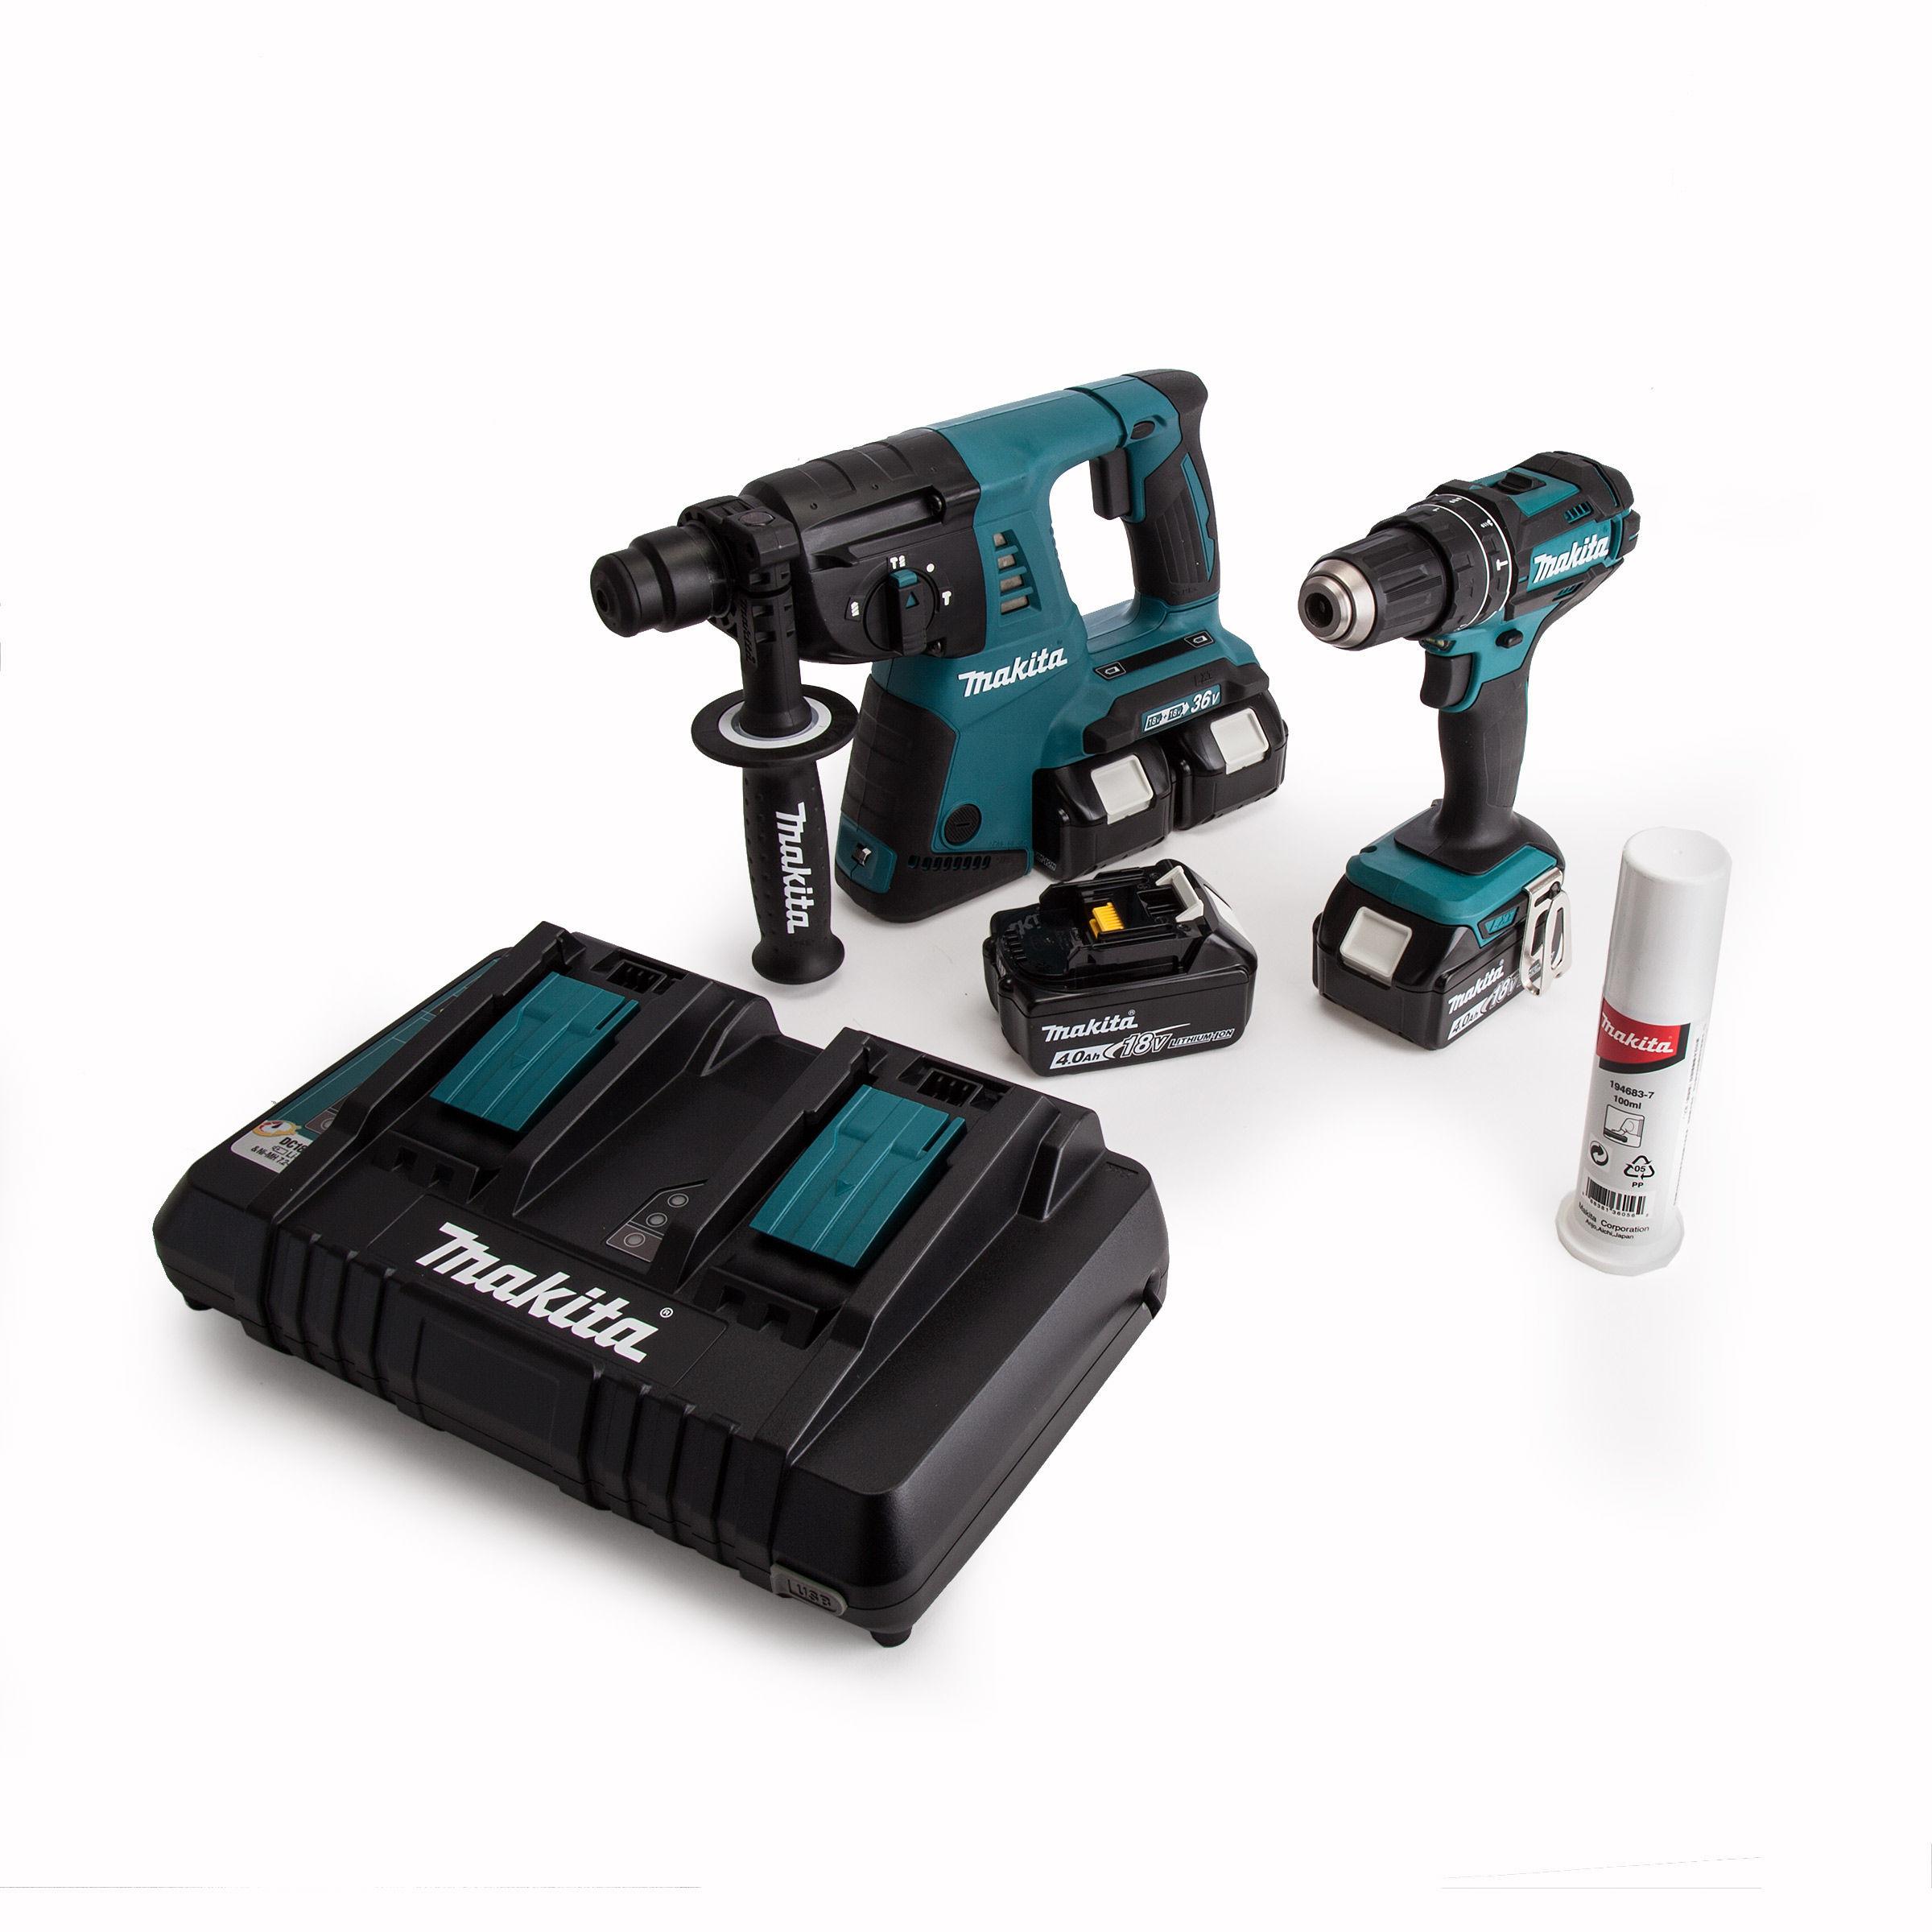 Makita DLX2137PMJ 2 Piece Cordless Kit 18V/36V DHP482 + DHR263 + 4 x 4Ah  Batteries Twin Charger